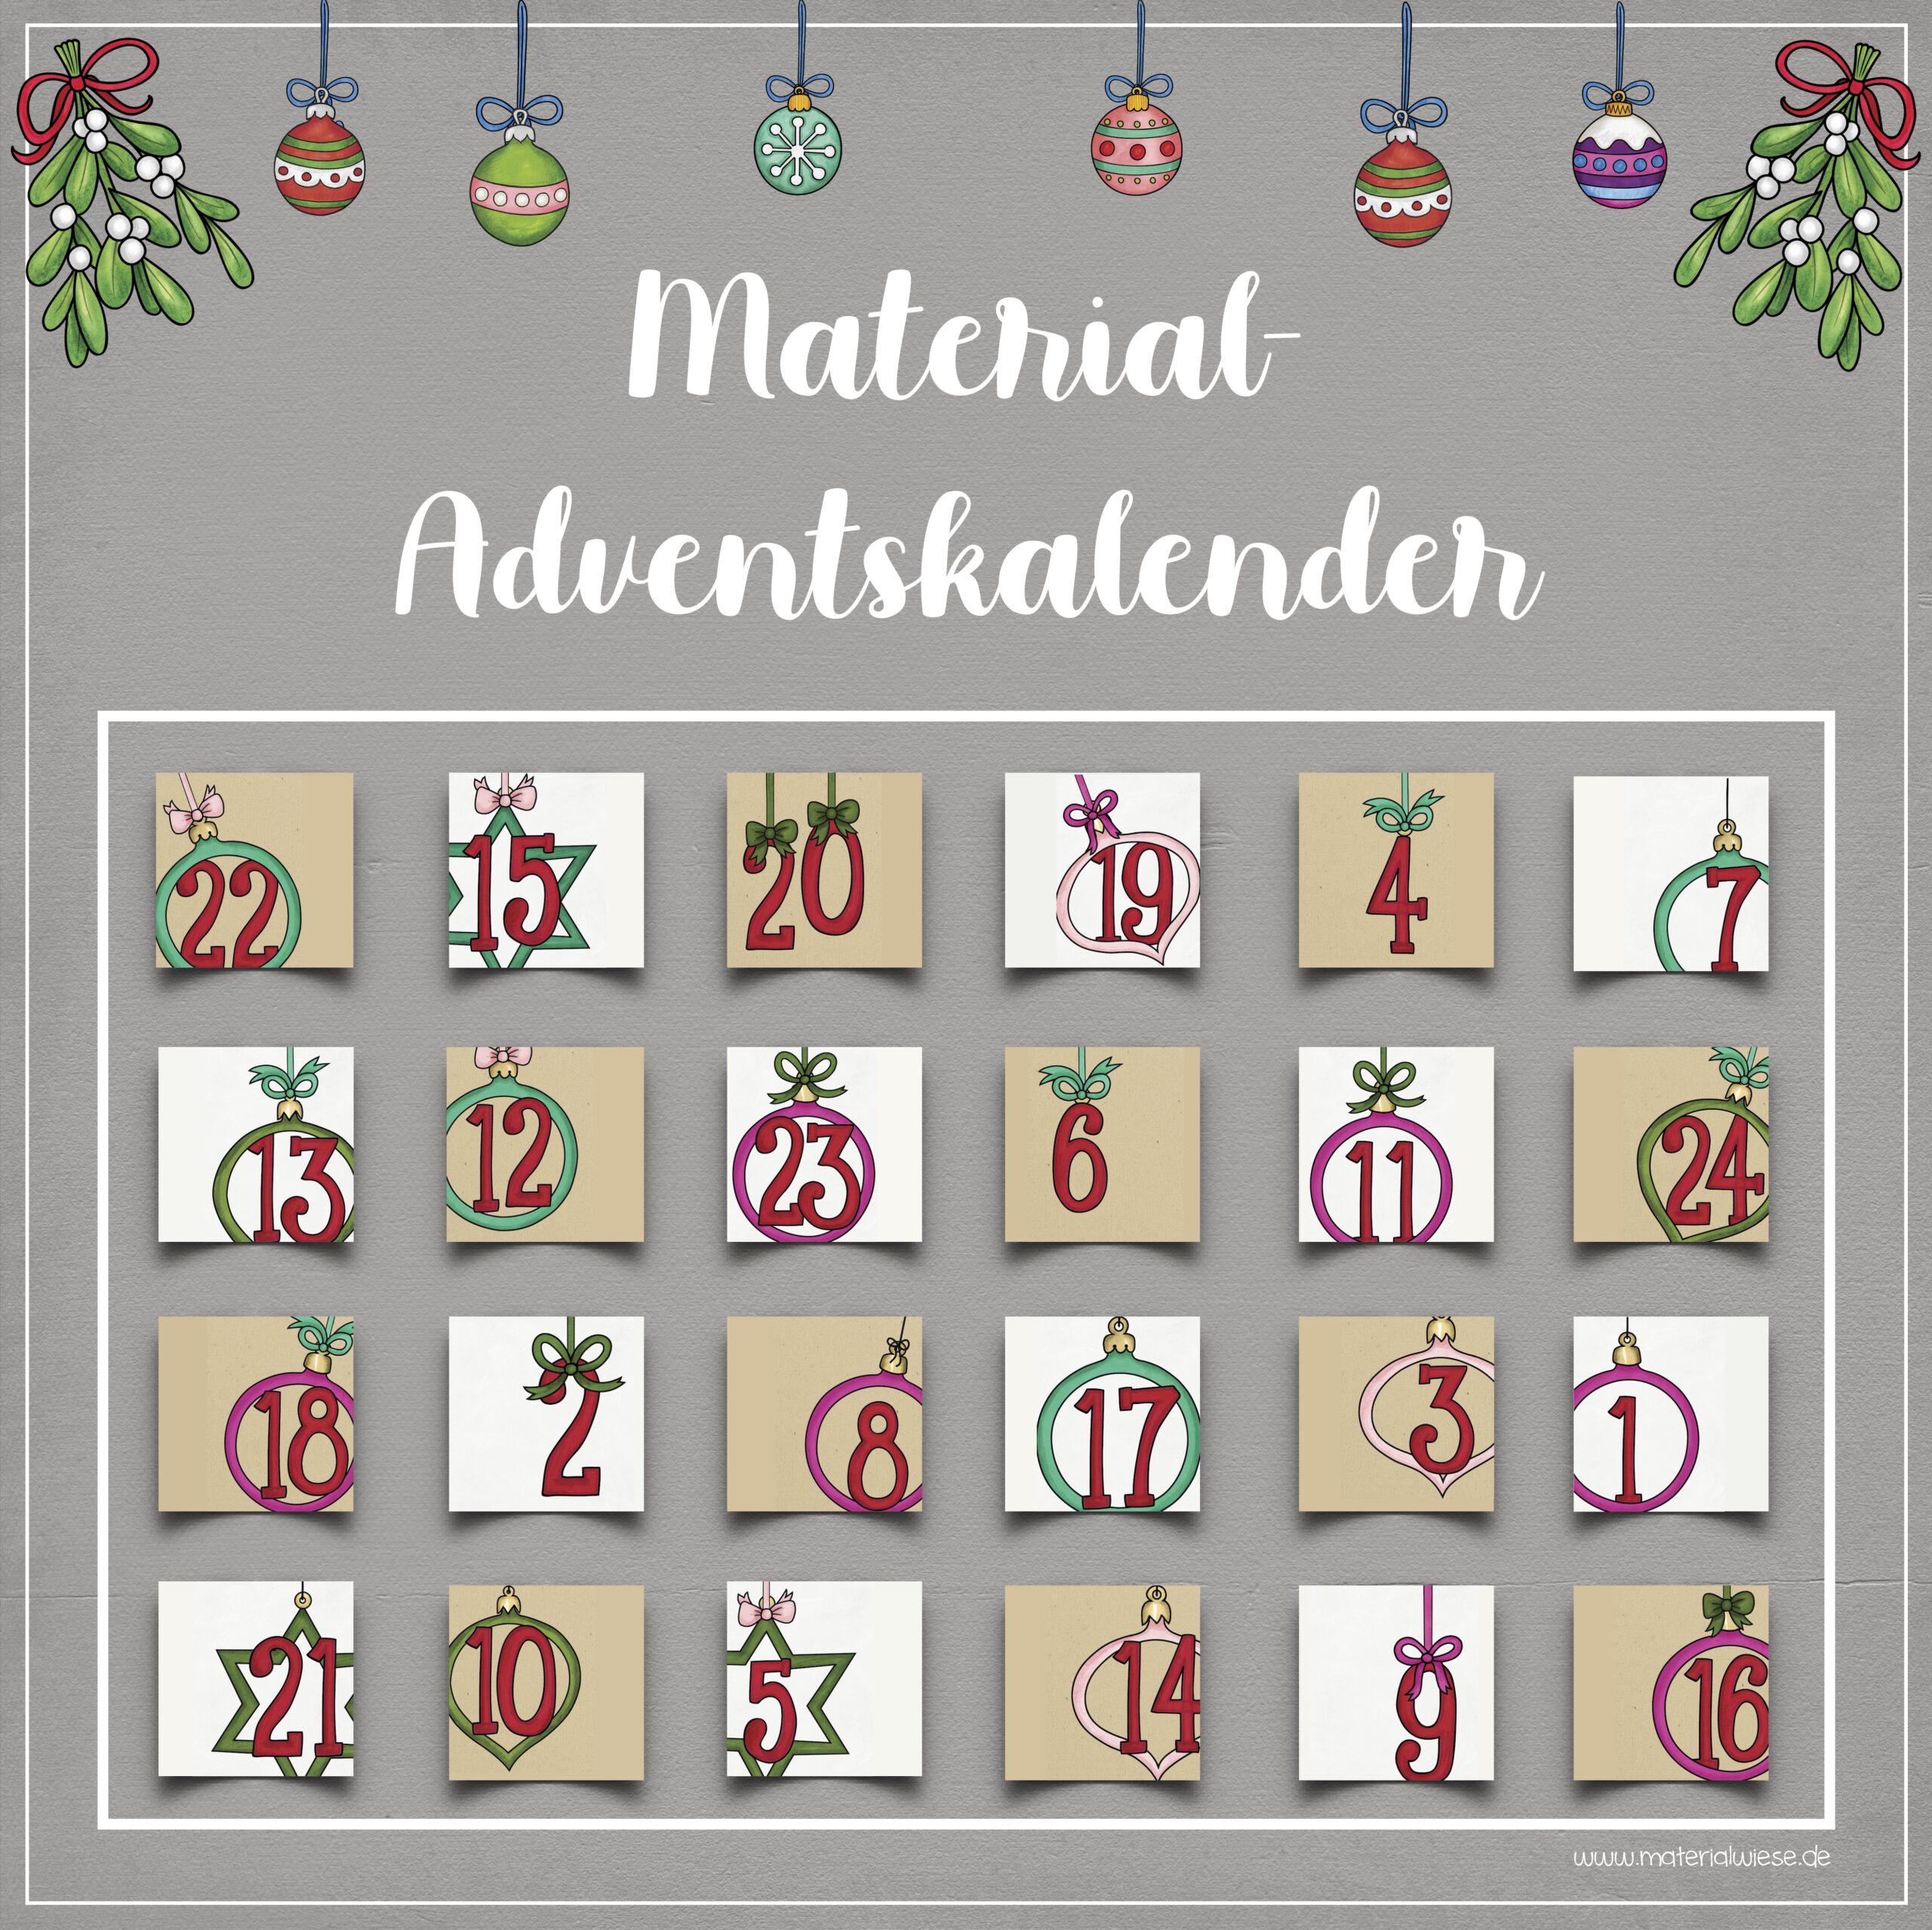 Material-Adventskalender